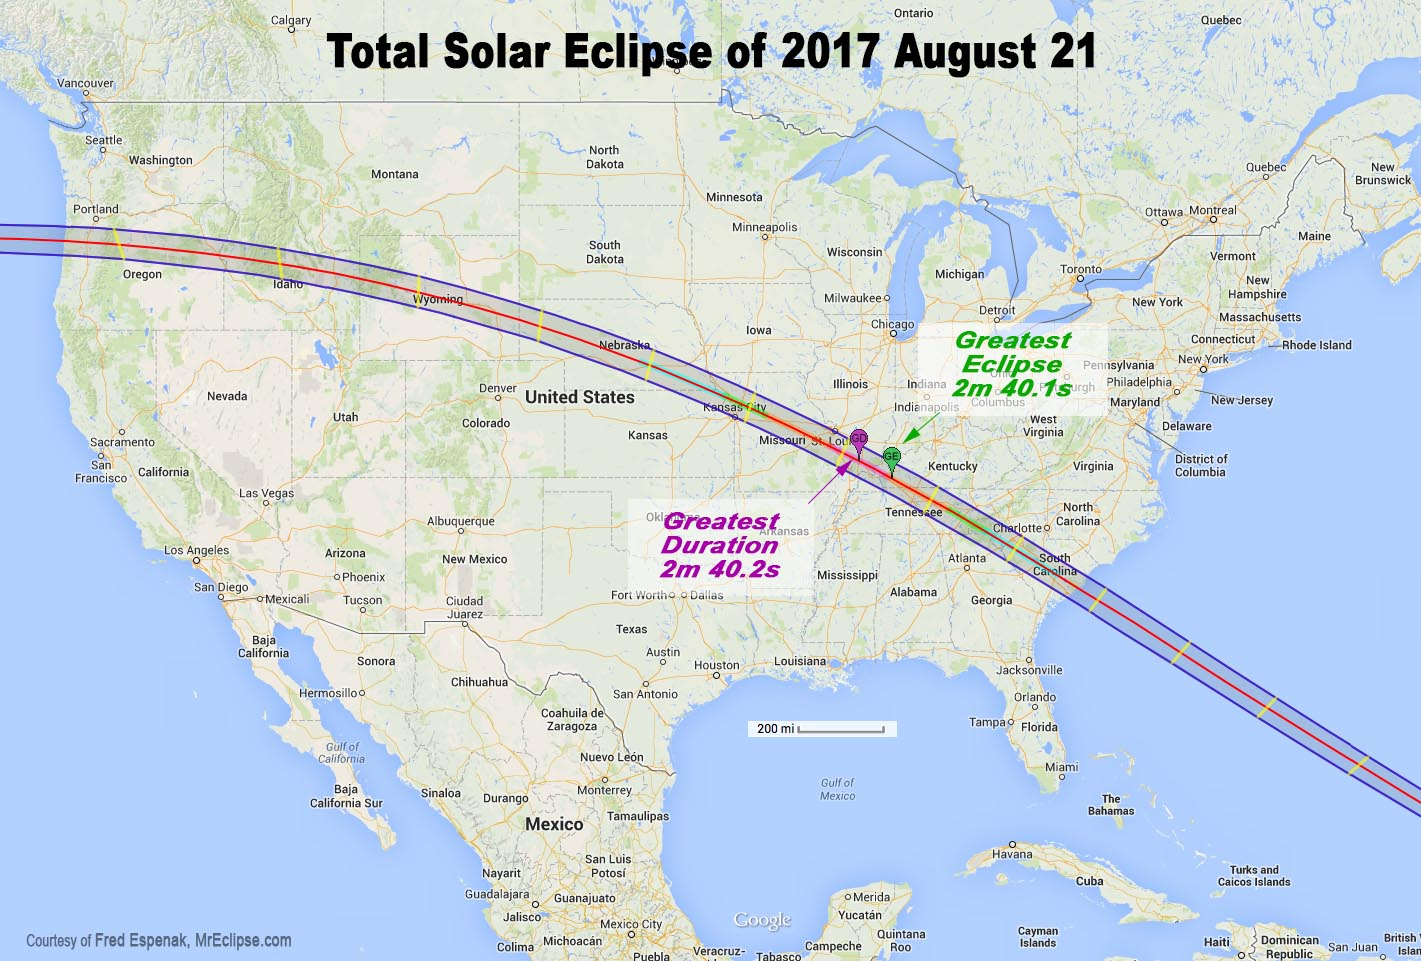 Eclipse Party! 13 Solar Eclipse Celebrations Across the U.S